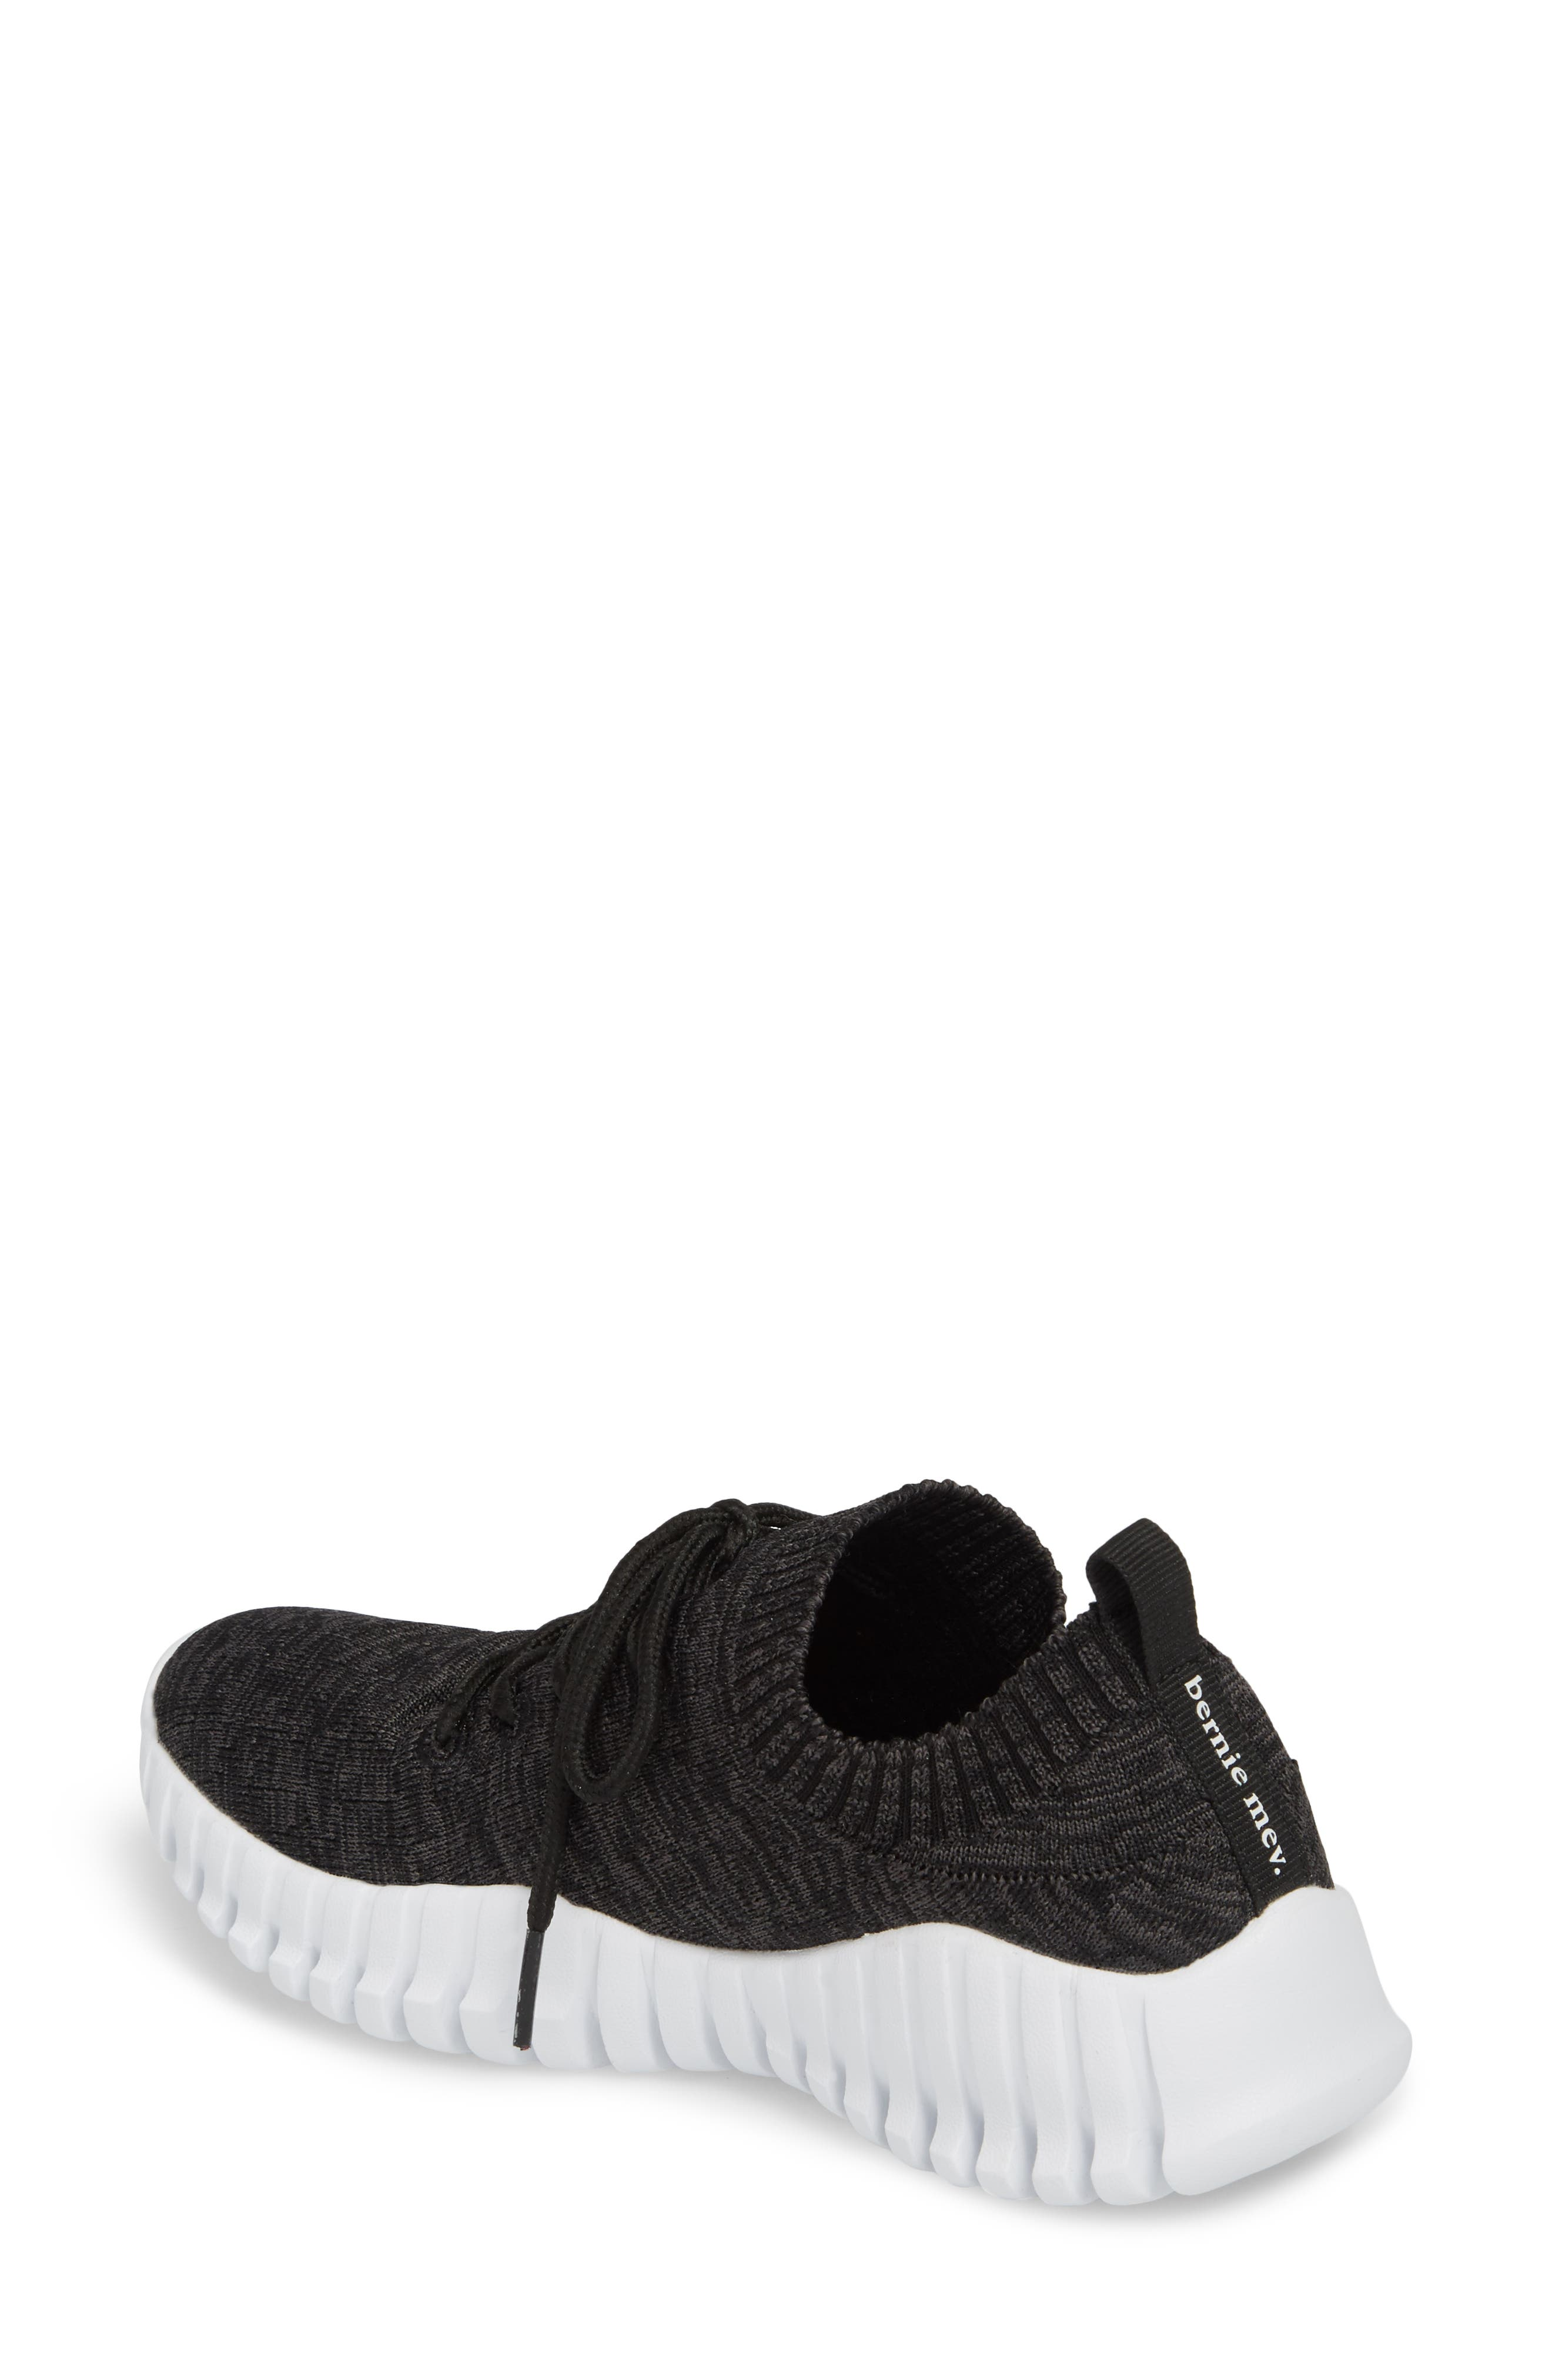 Gravity Sneaker,                             Alternate thumbnail 2, color,                             BLACK GREY